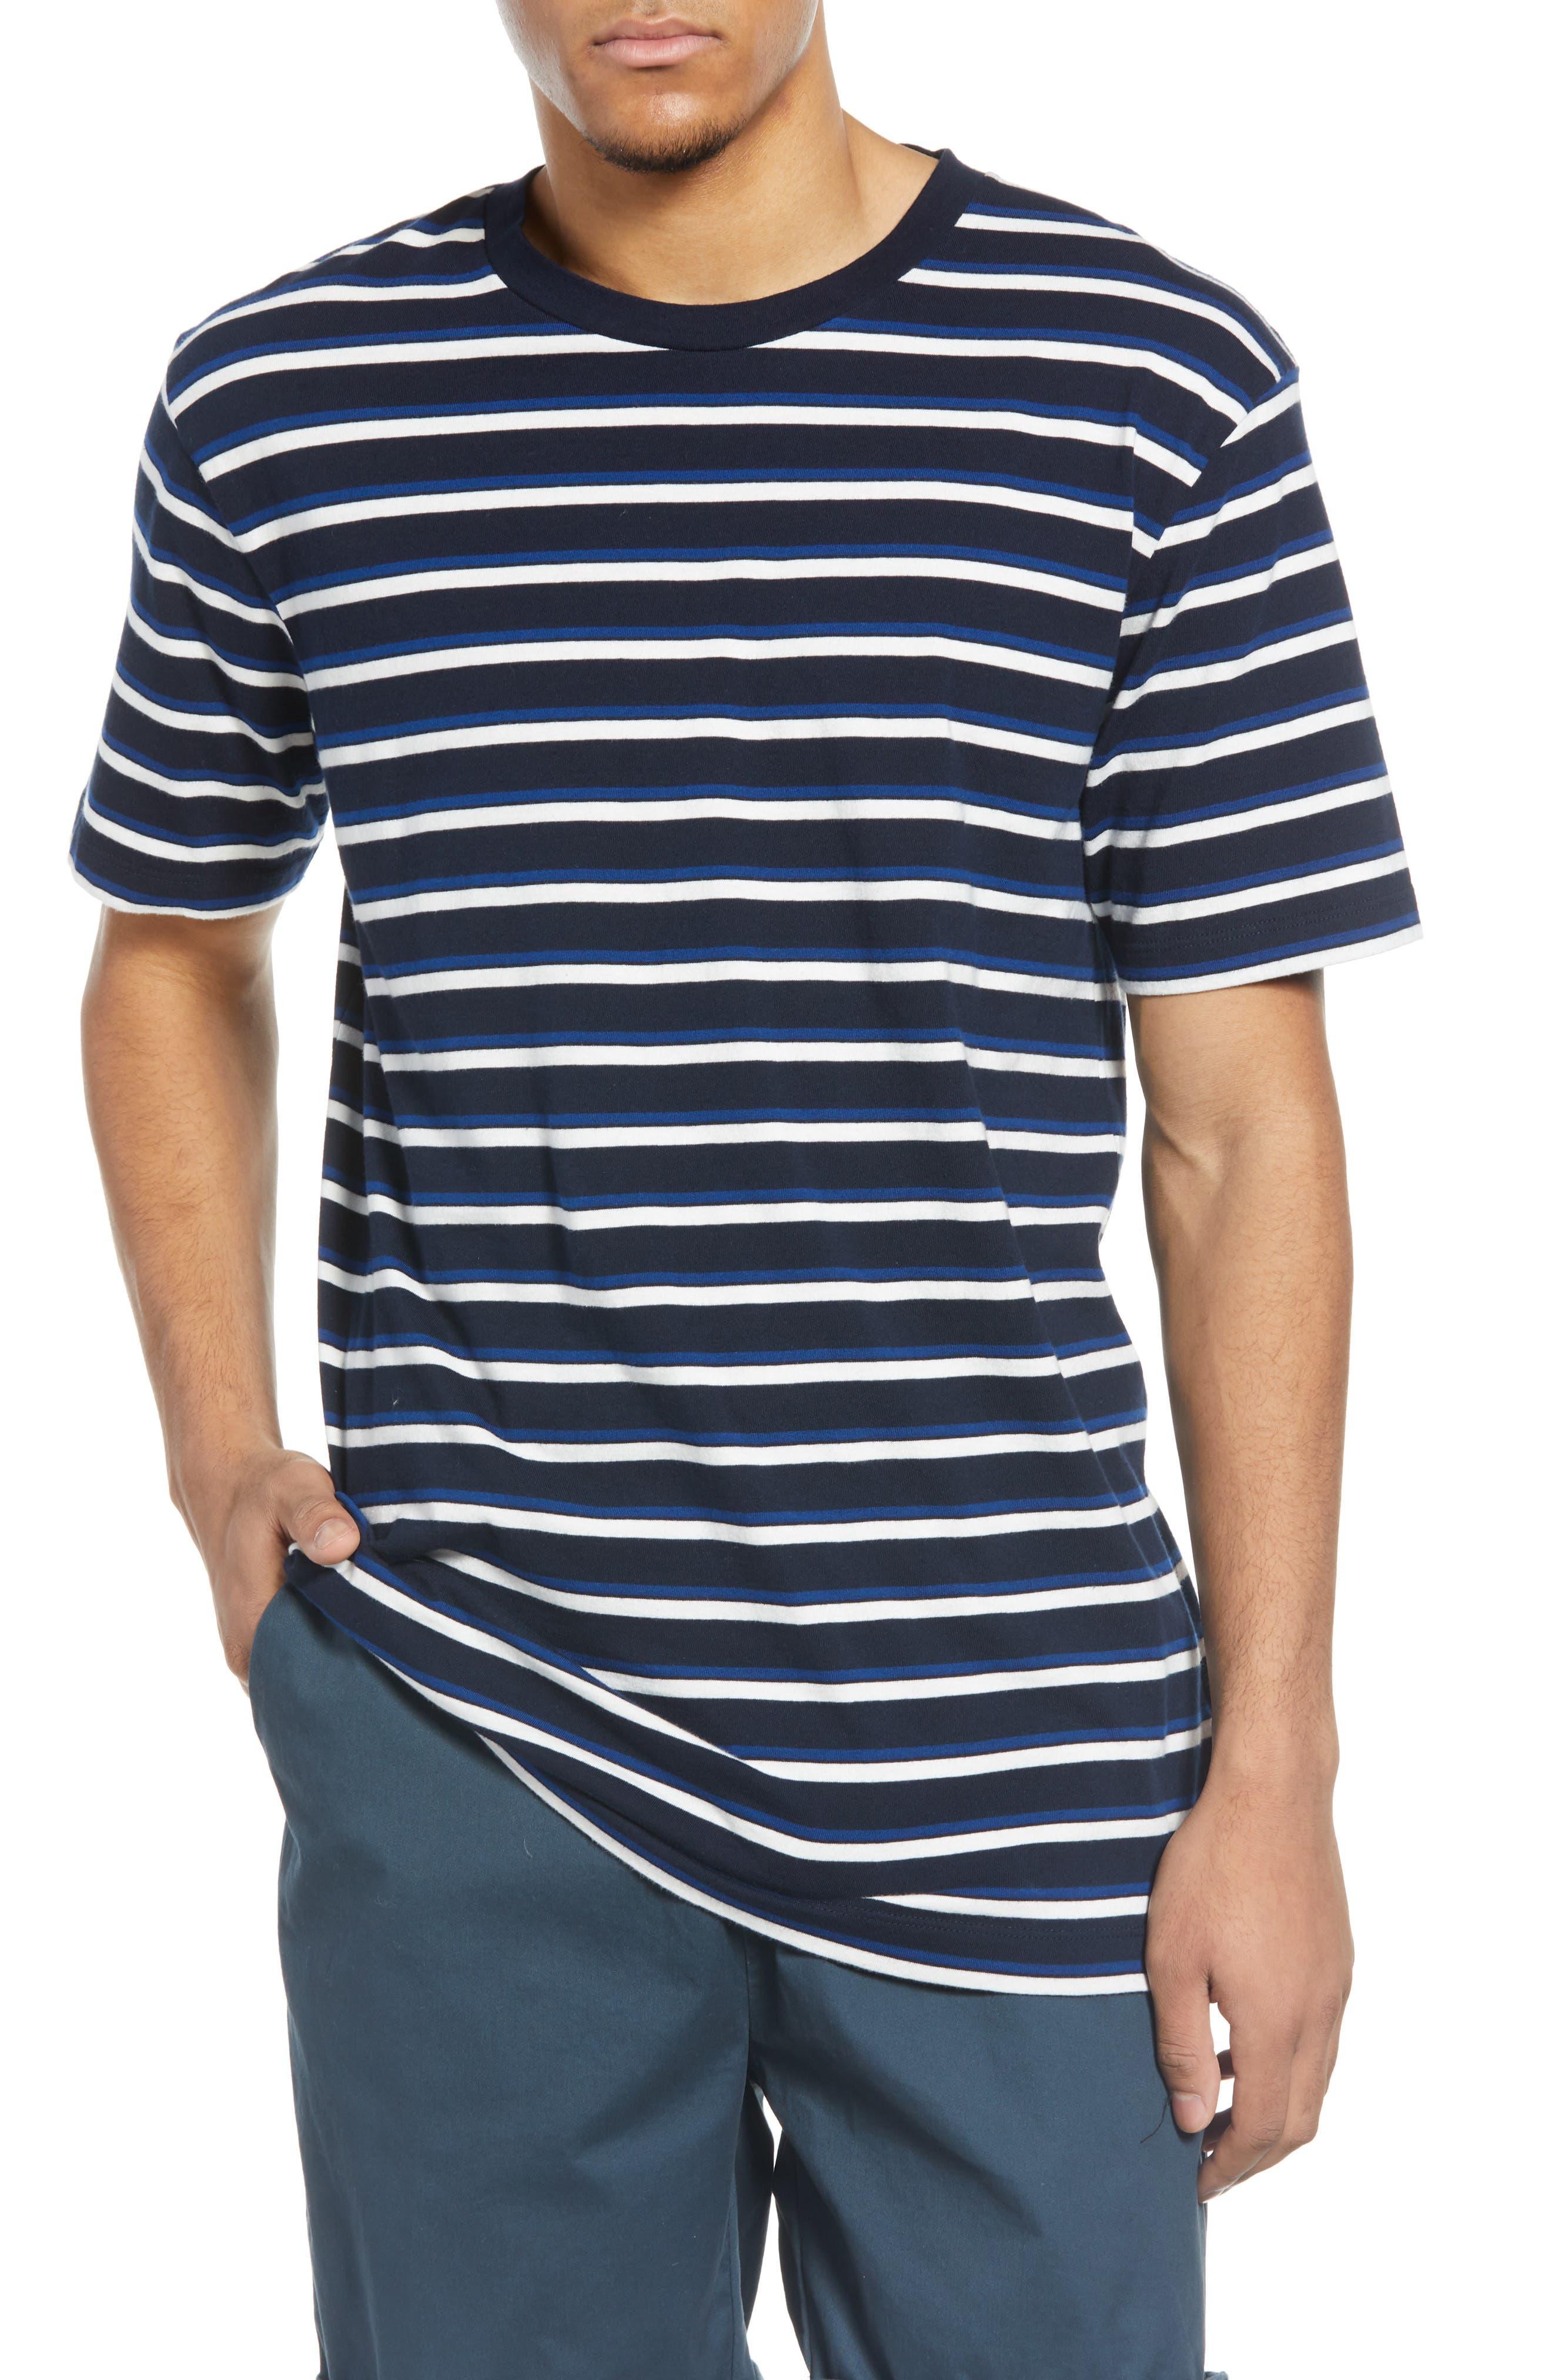 Image of Scotch & Soda Longline Crewneck T-Shirt